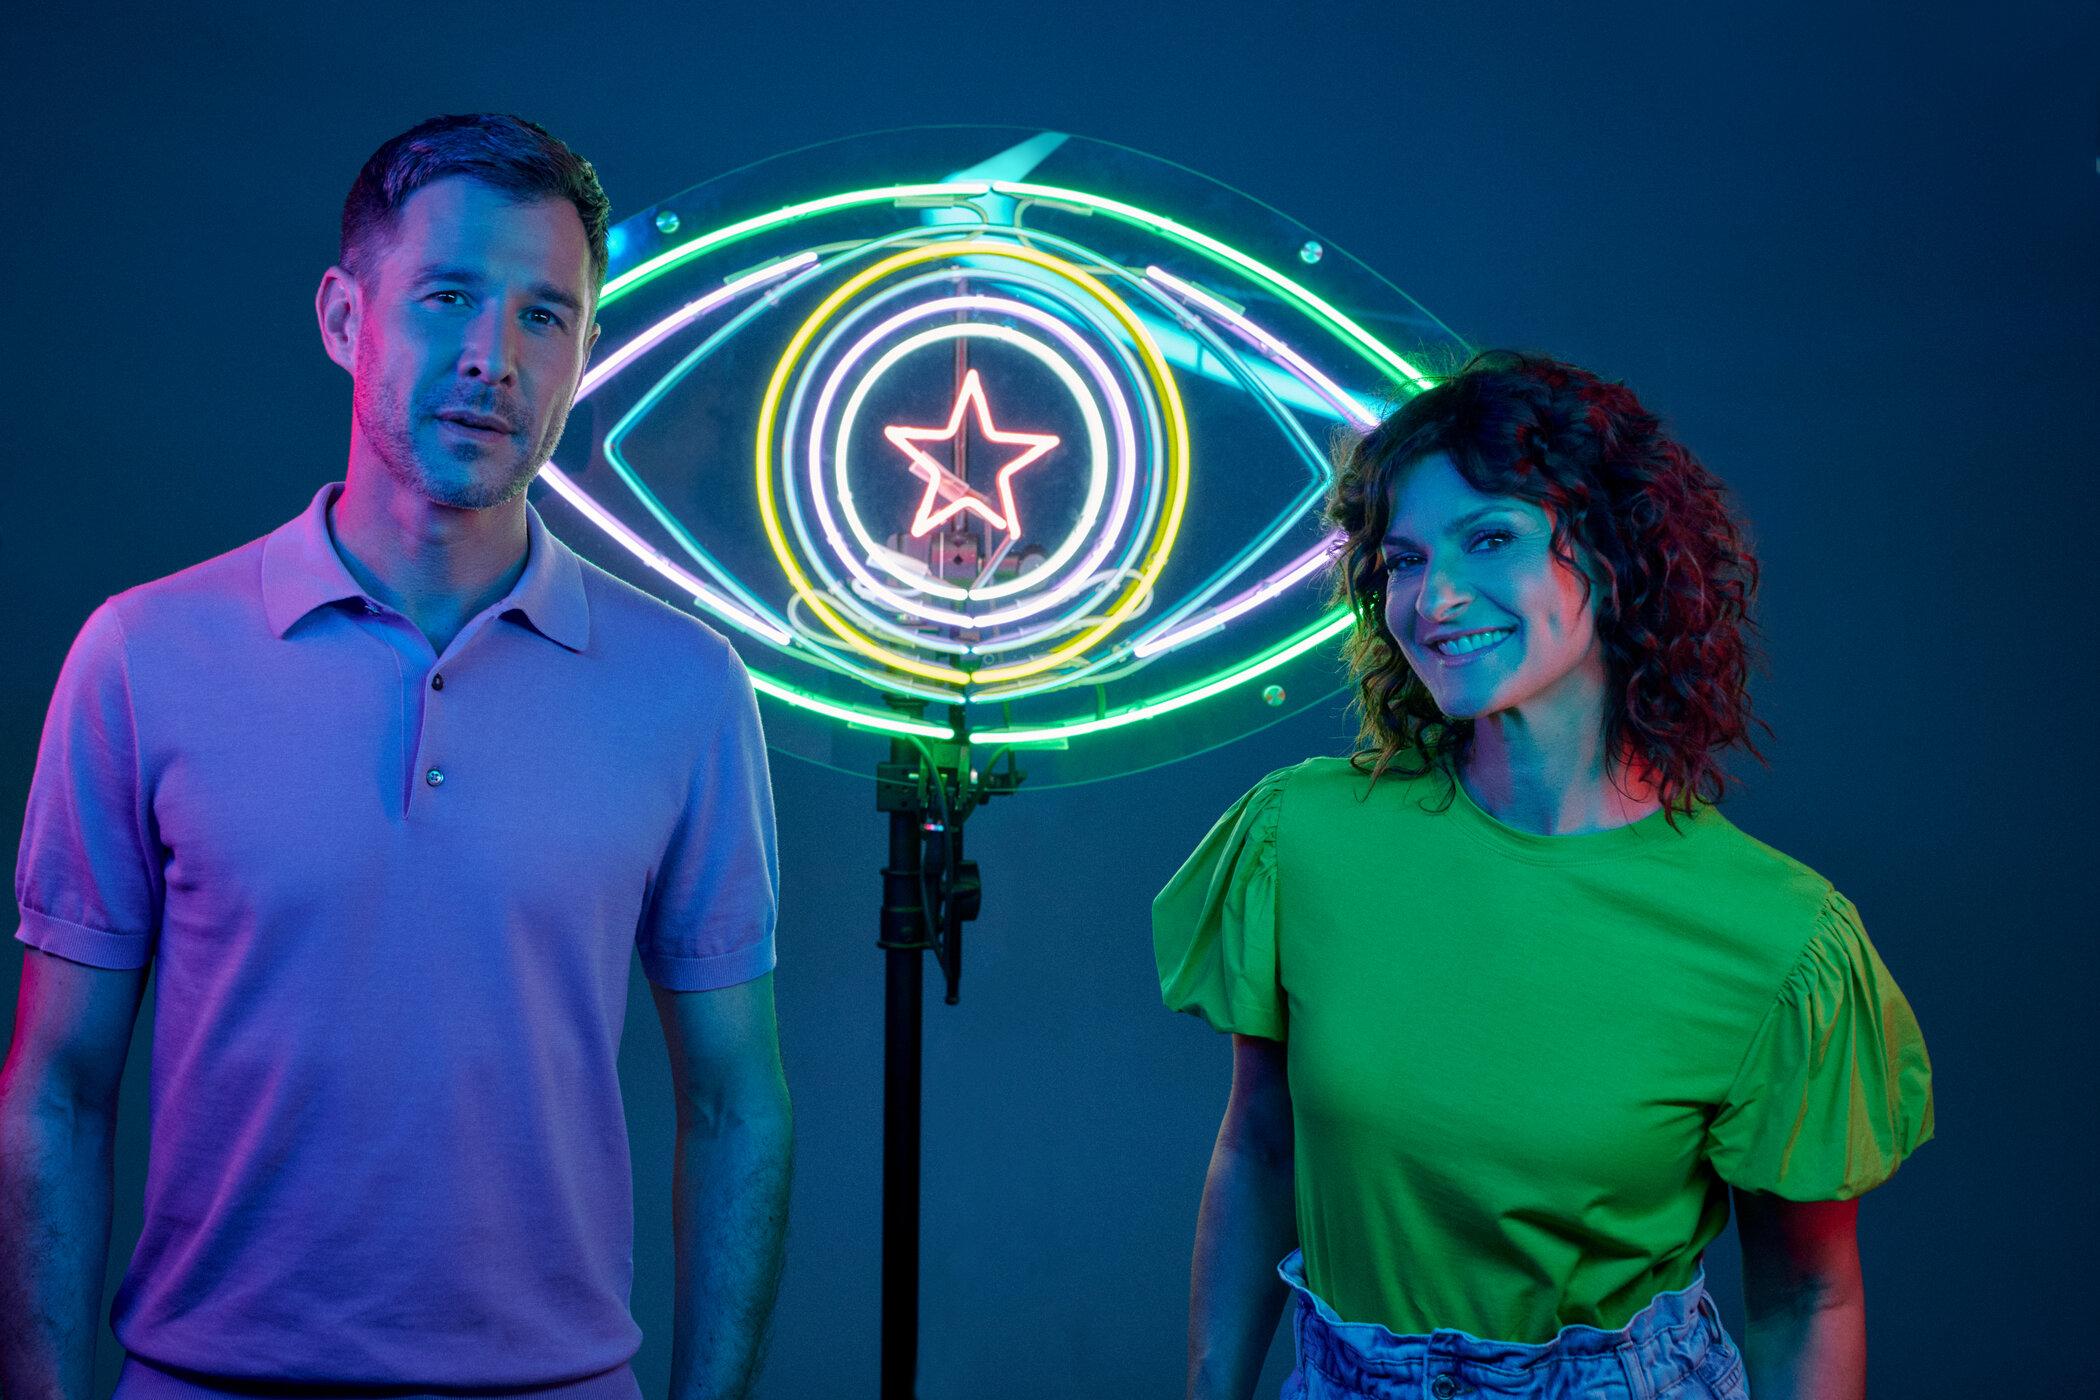 Promi Big Brother 2021 News